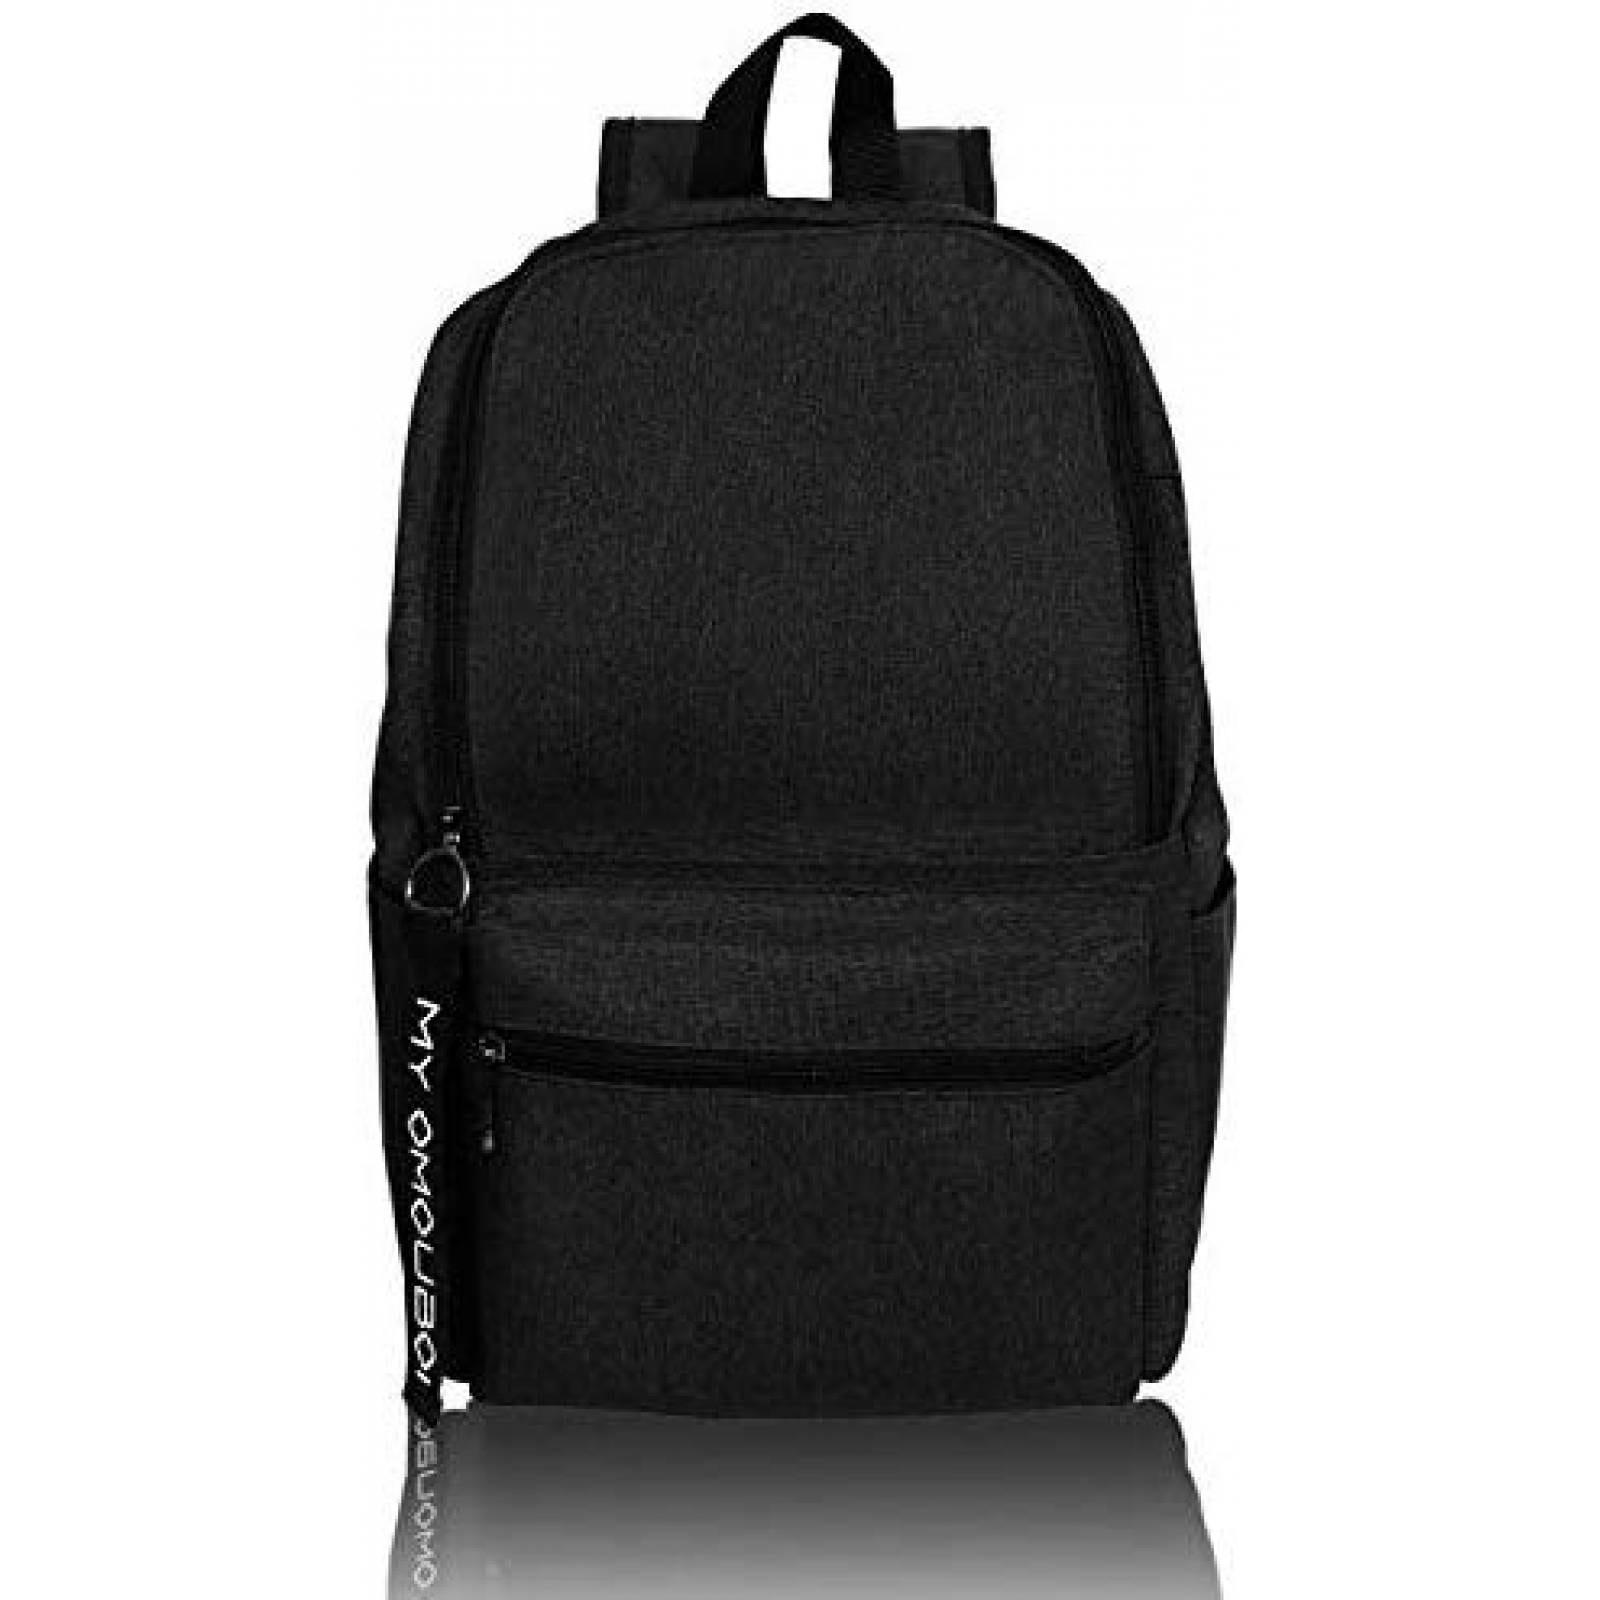 Mochila OMOUBOI Superbreak Backpack de Canvas Casual -Negro